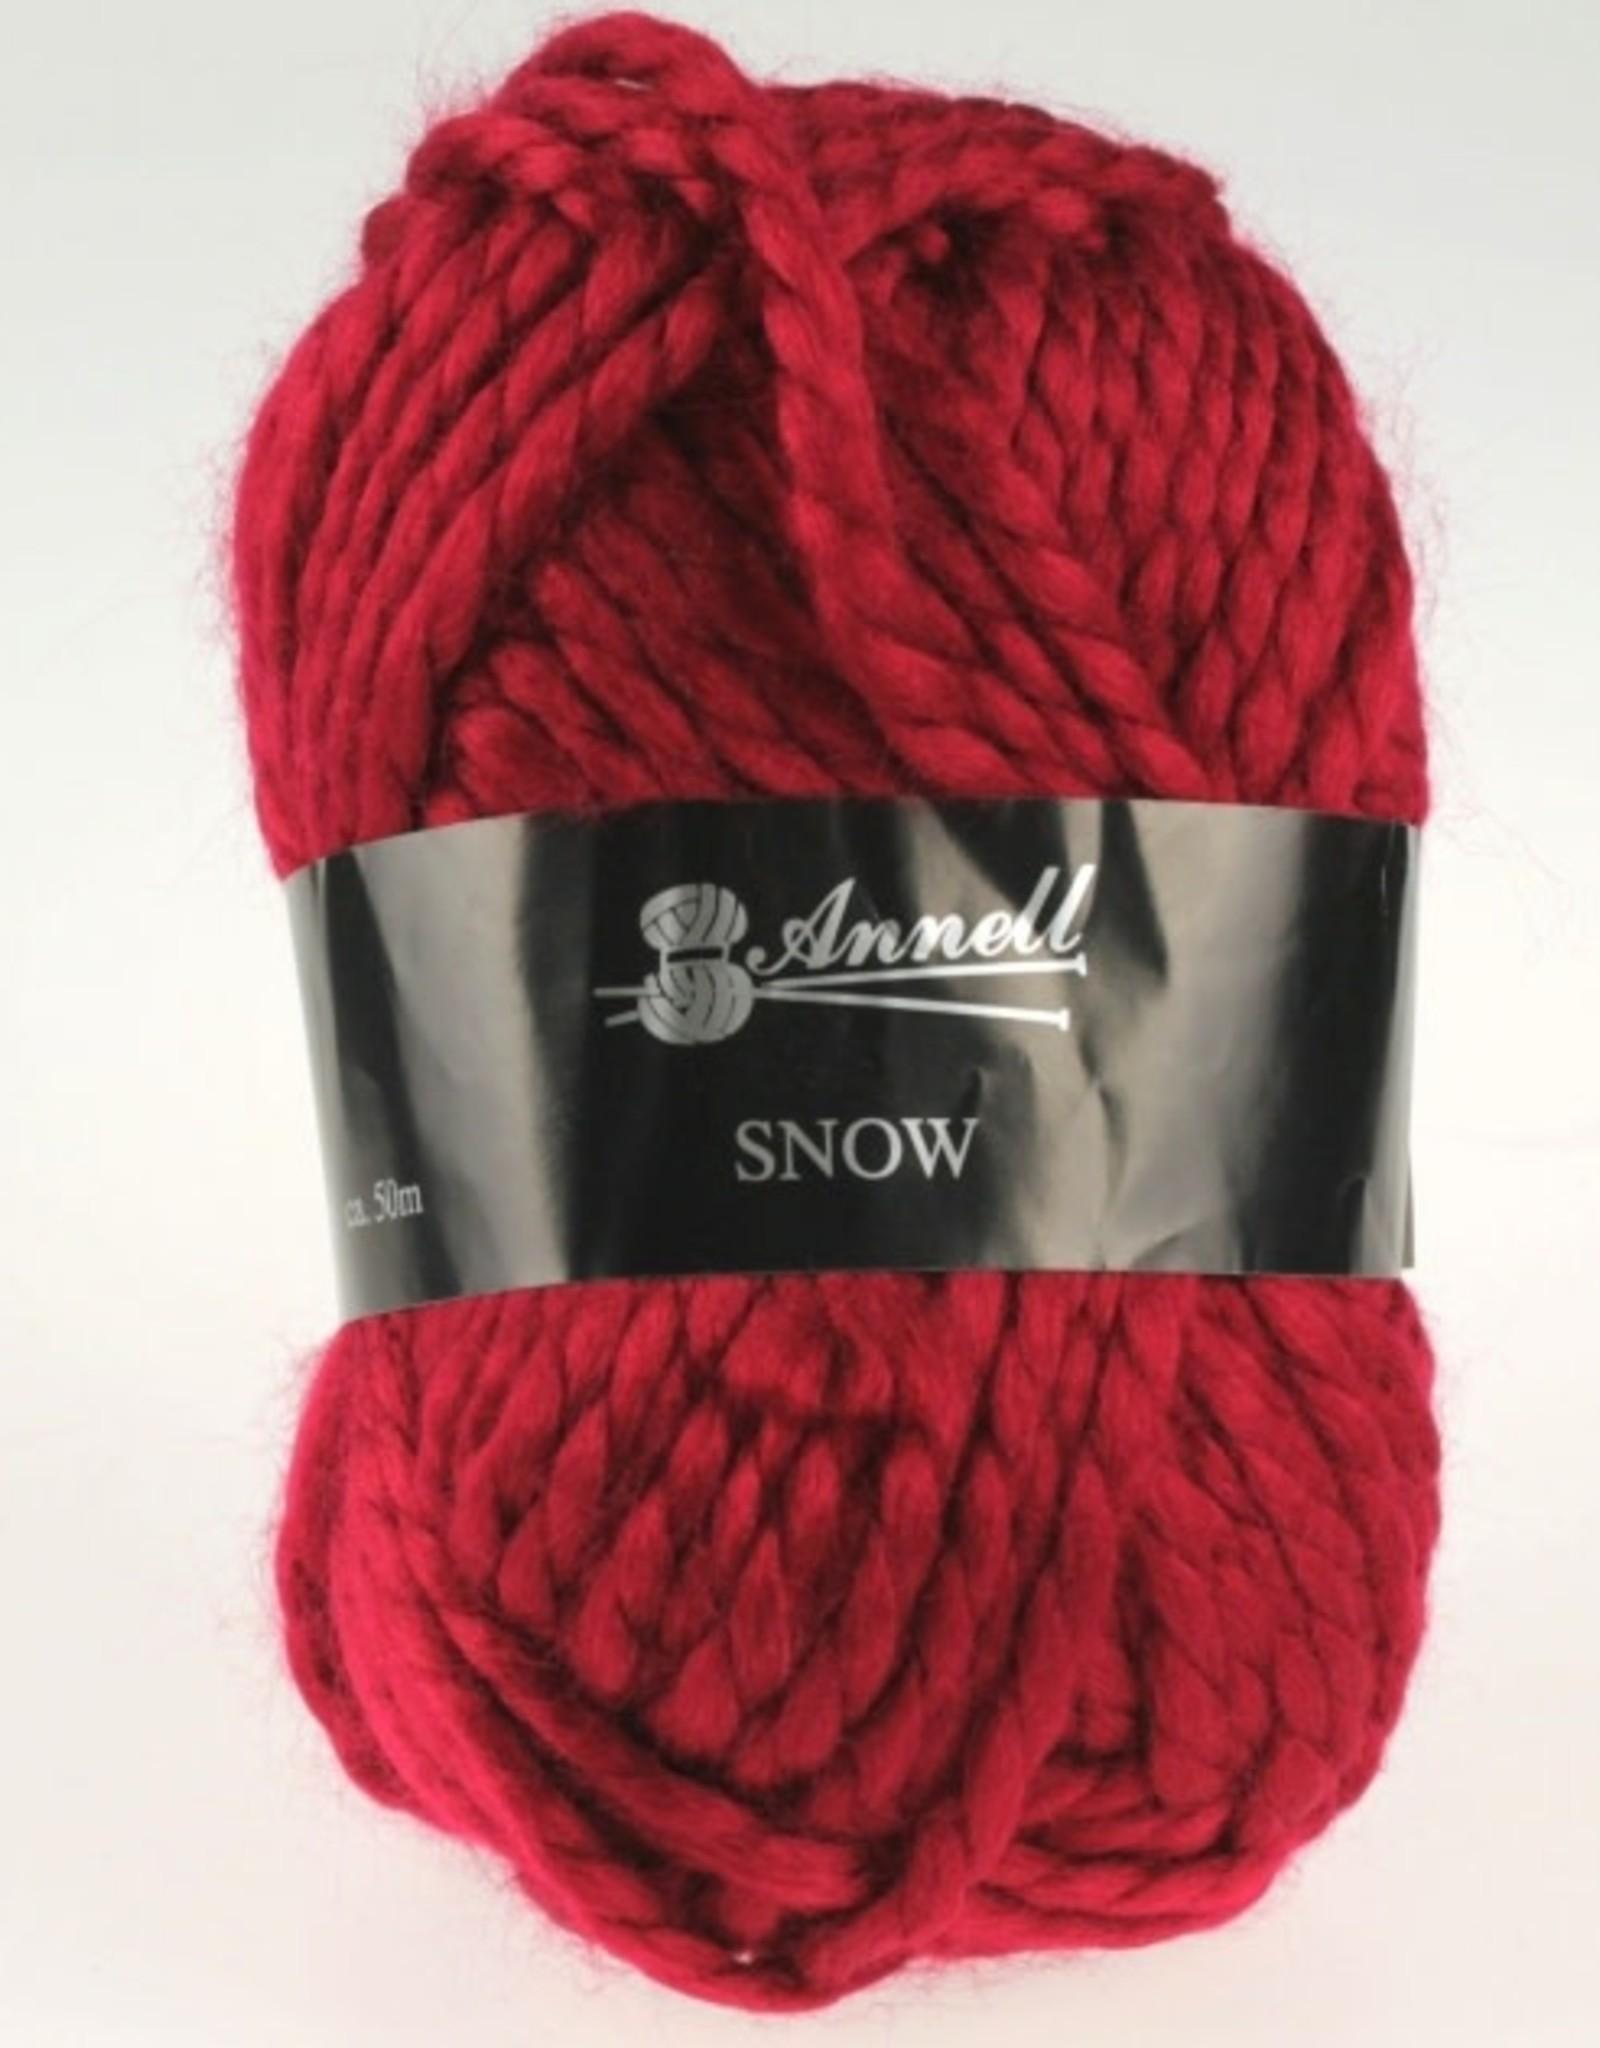 Annell Annell Snow 3913